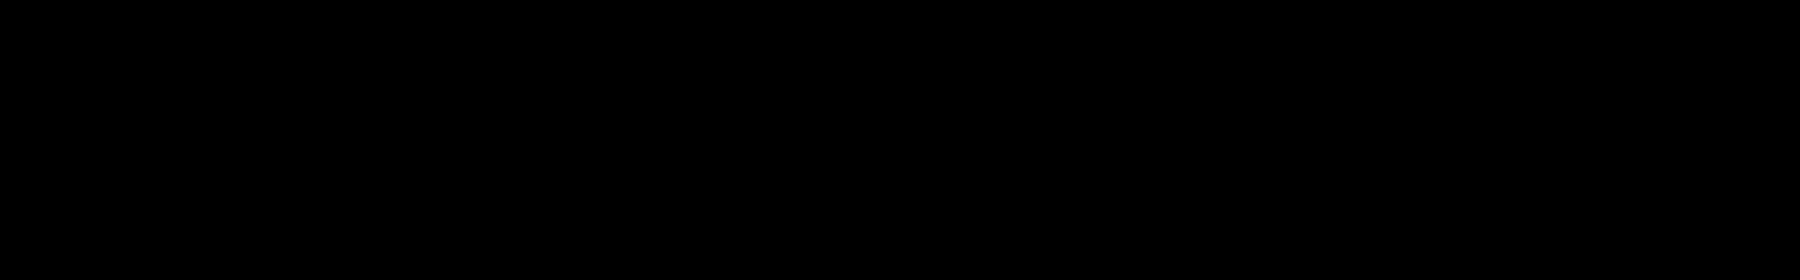 Dramatica (Piano MIDI + Loop Pack) audio waveform